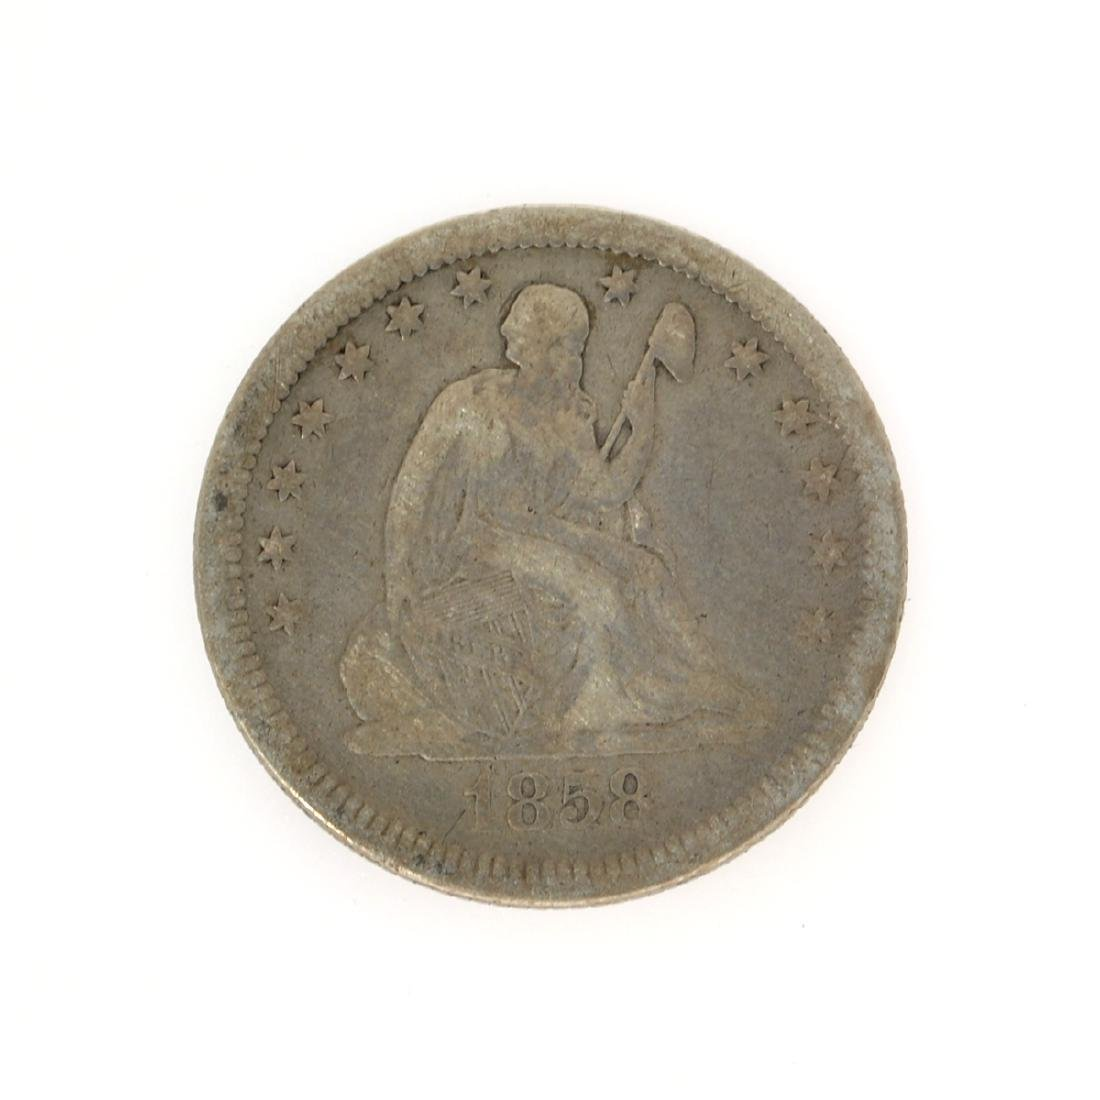 Rare 1858 Liberty Seated Quarter Dollar Coin